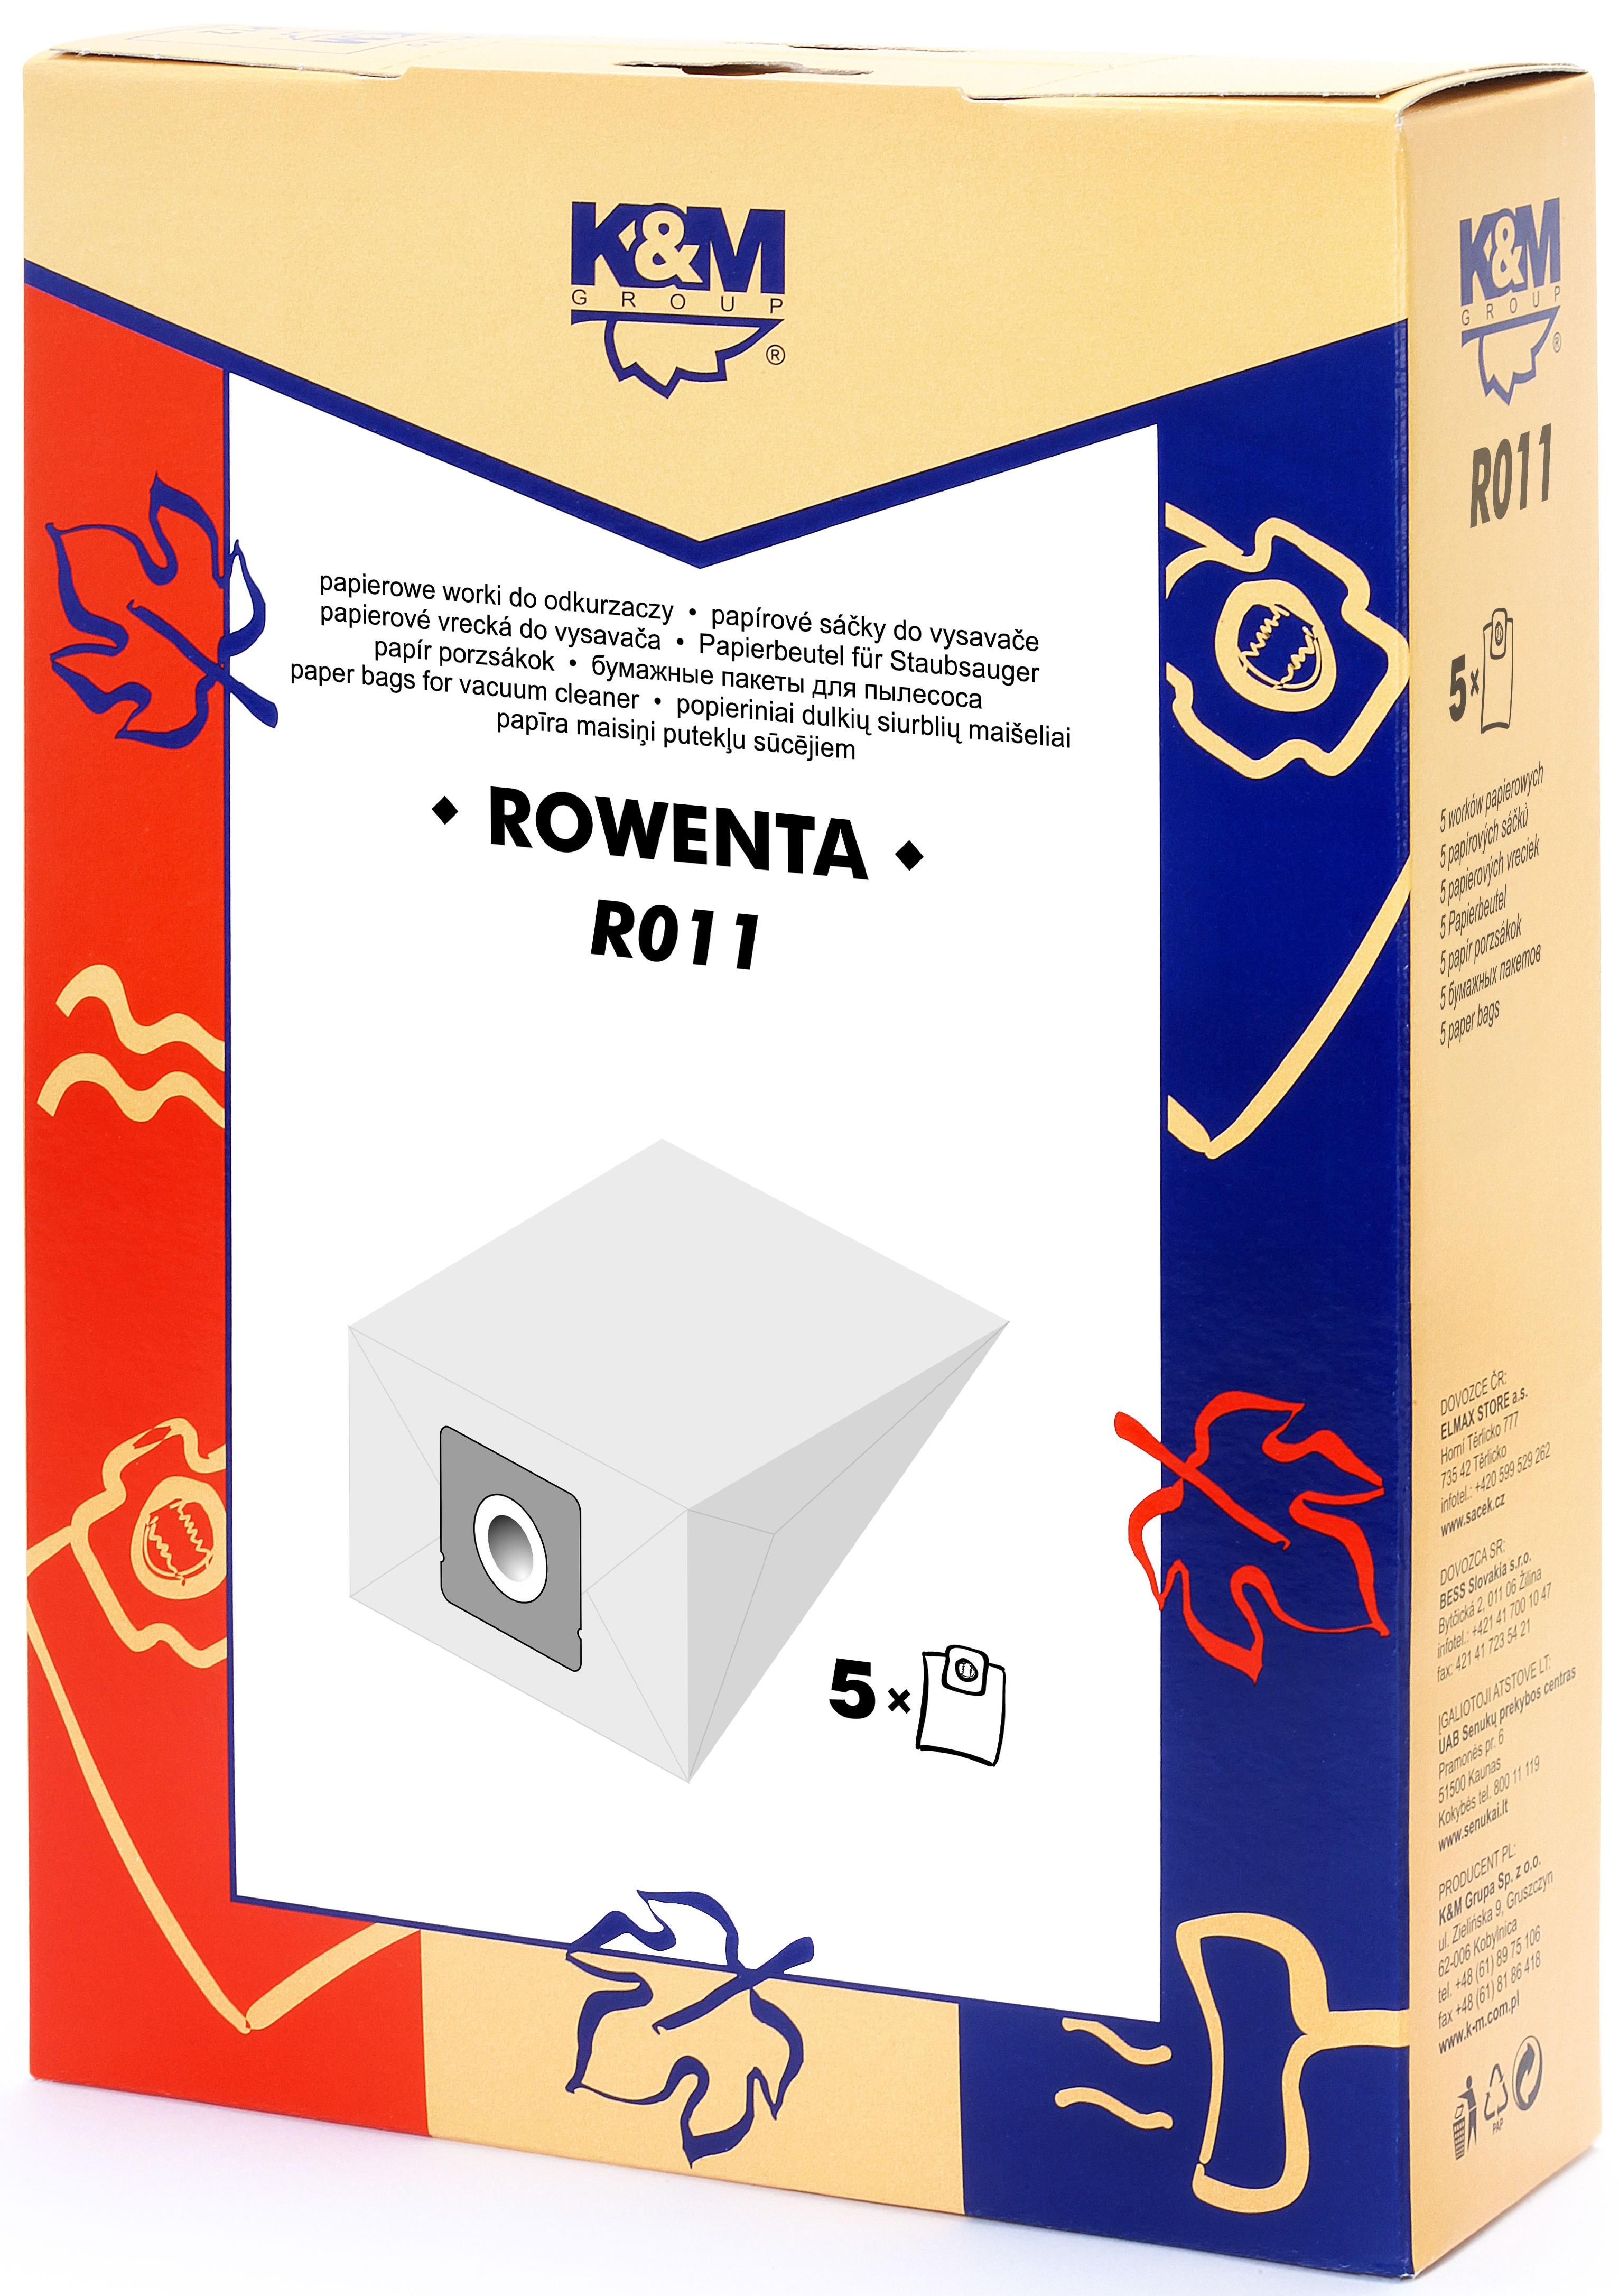 Sac aspirator Rowenta ZR 17, hartie, 5X saci, K&M [0]